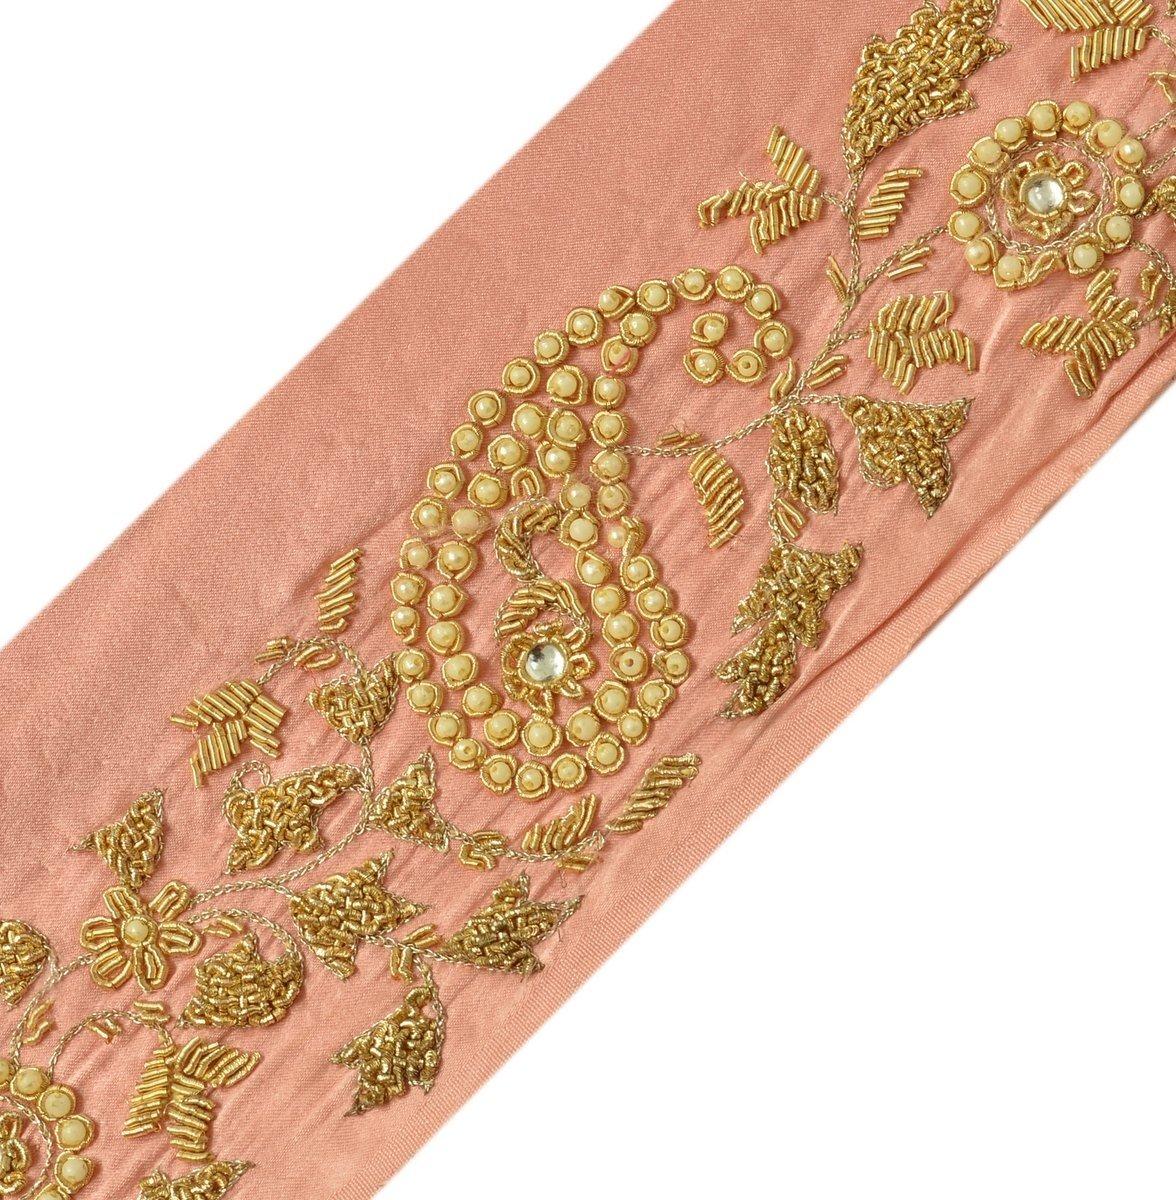 Trim & Edging Good Vintage Sari Border Antique Hand Embroidered Indian Trim Ribbon Peach Lace